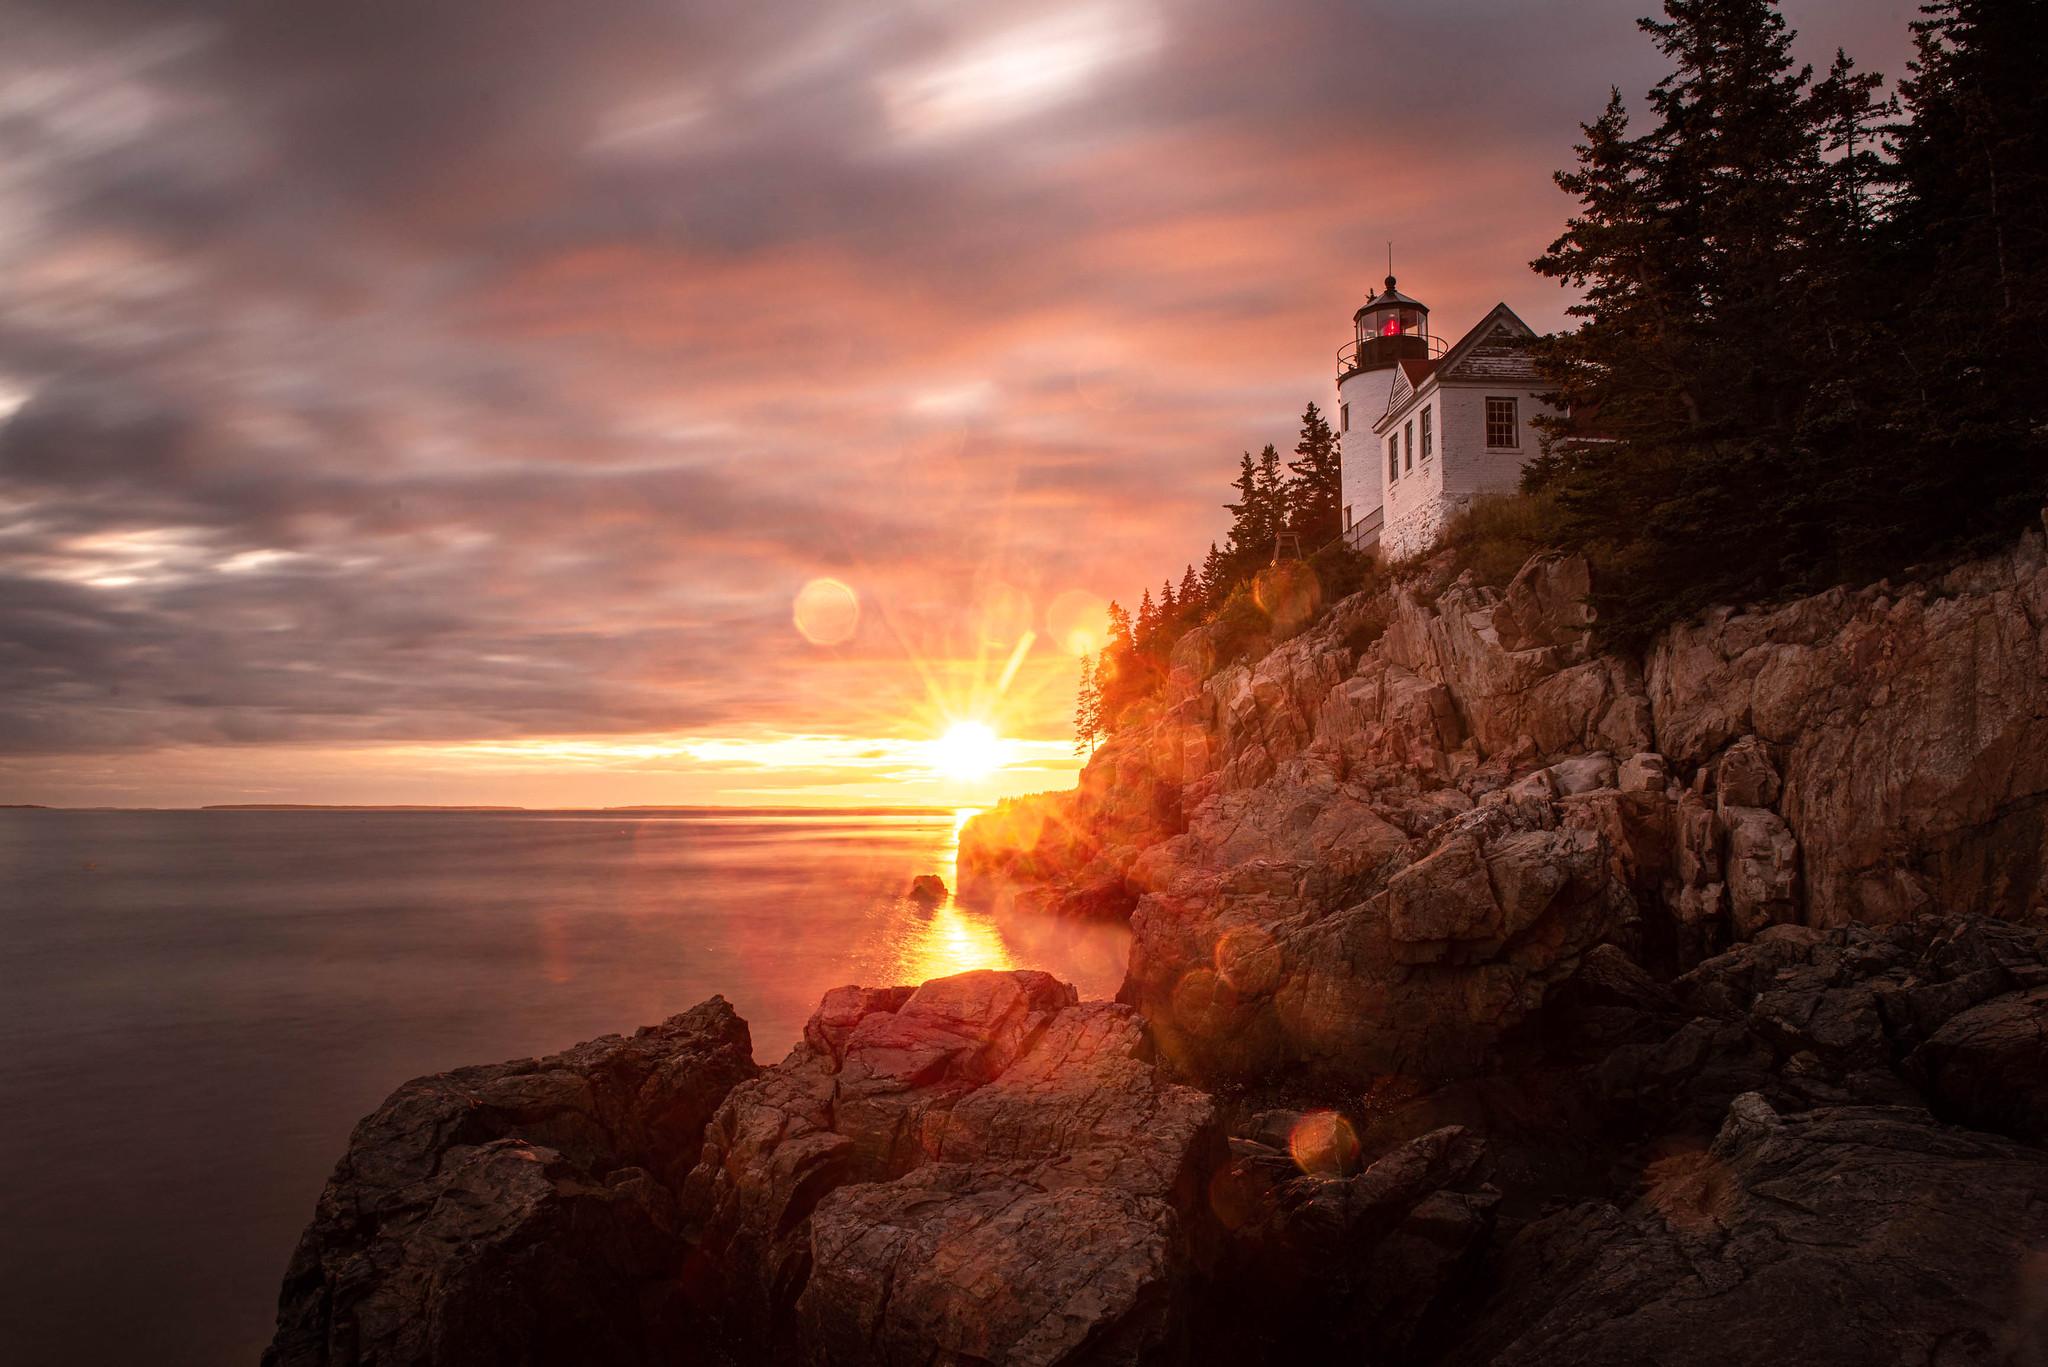 Bass Harbor Lighthouse, Mount Desert Island ME